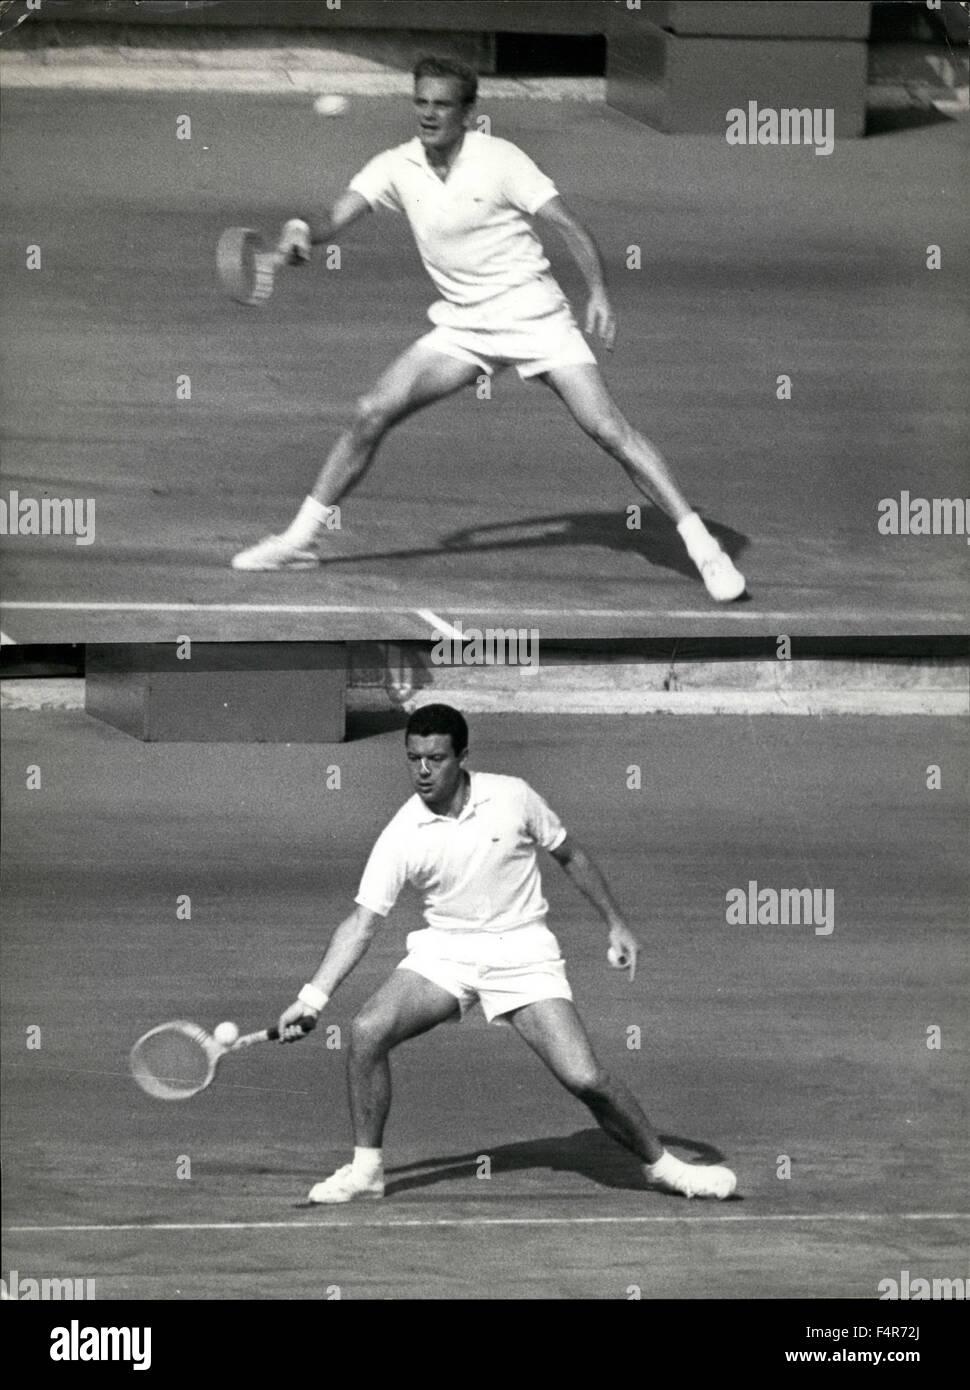 1971 Rome Davis Cup Tournament Interzone finals bottom